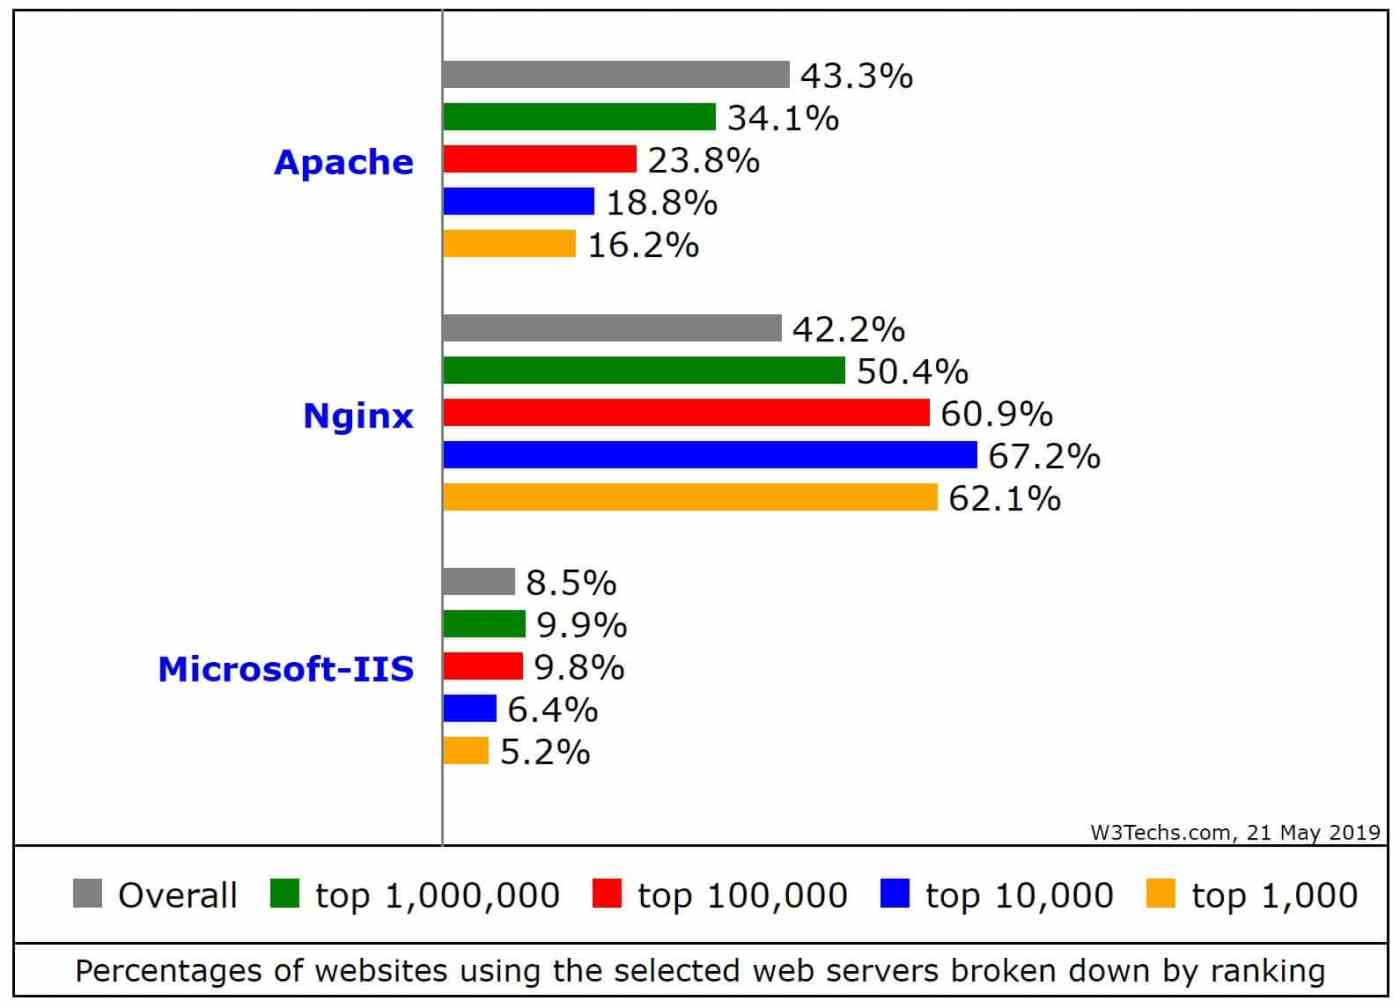 Percentage of websites using Nginx